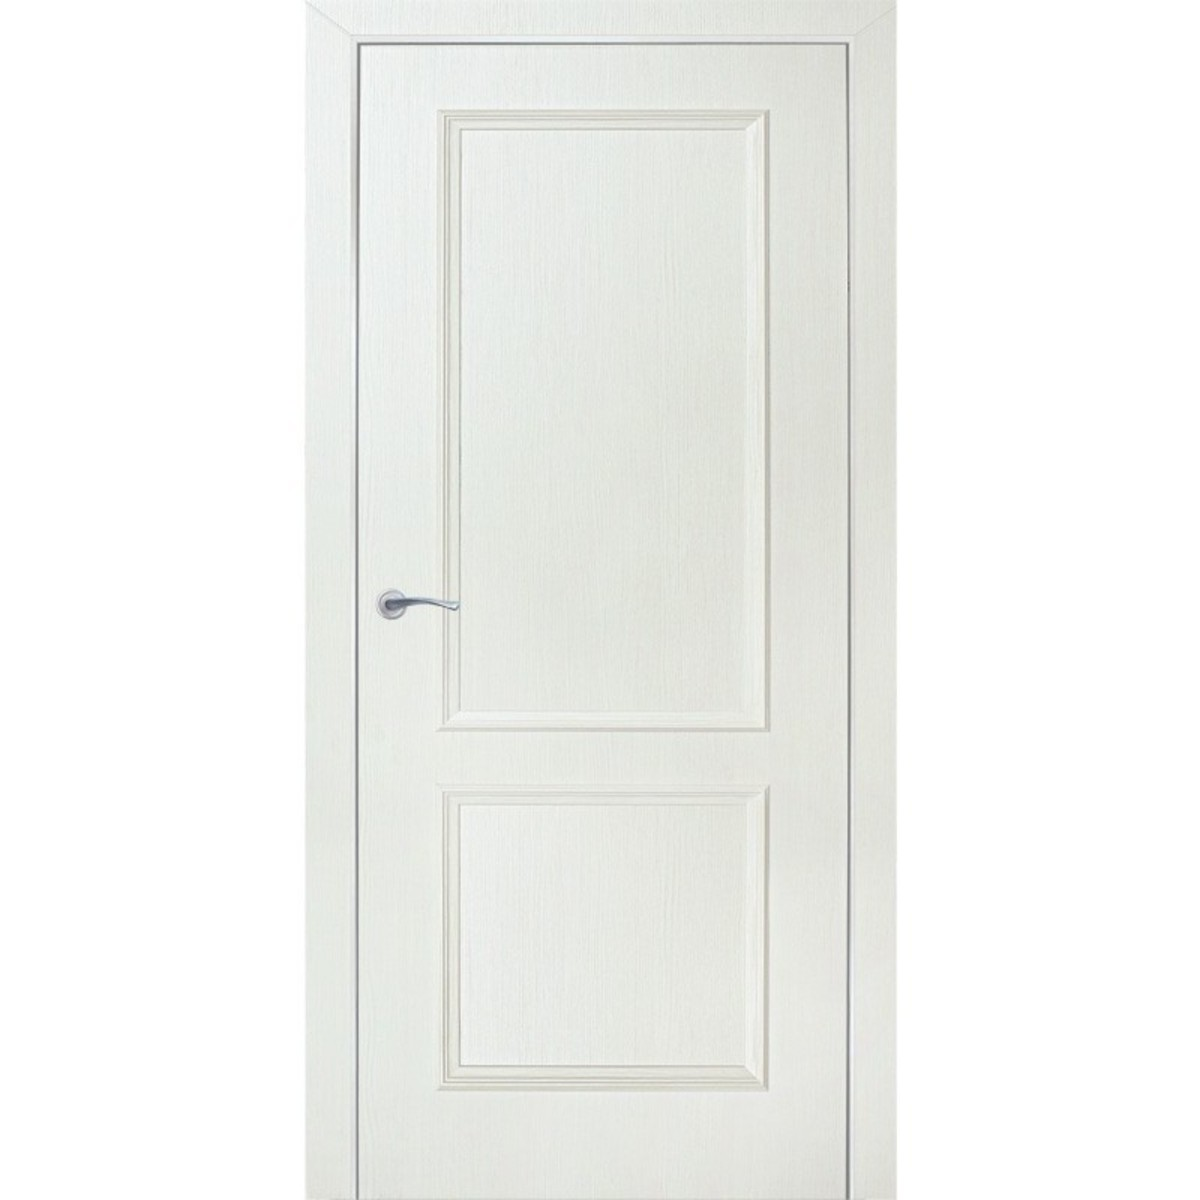 Дверь межкомнатная глухая Altro 70x200 см ламинация цвет бьянко 3D